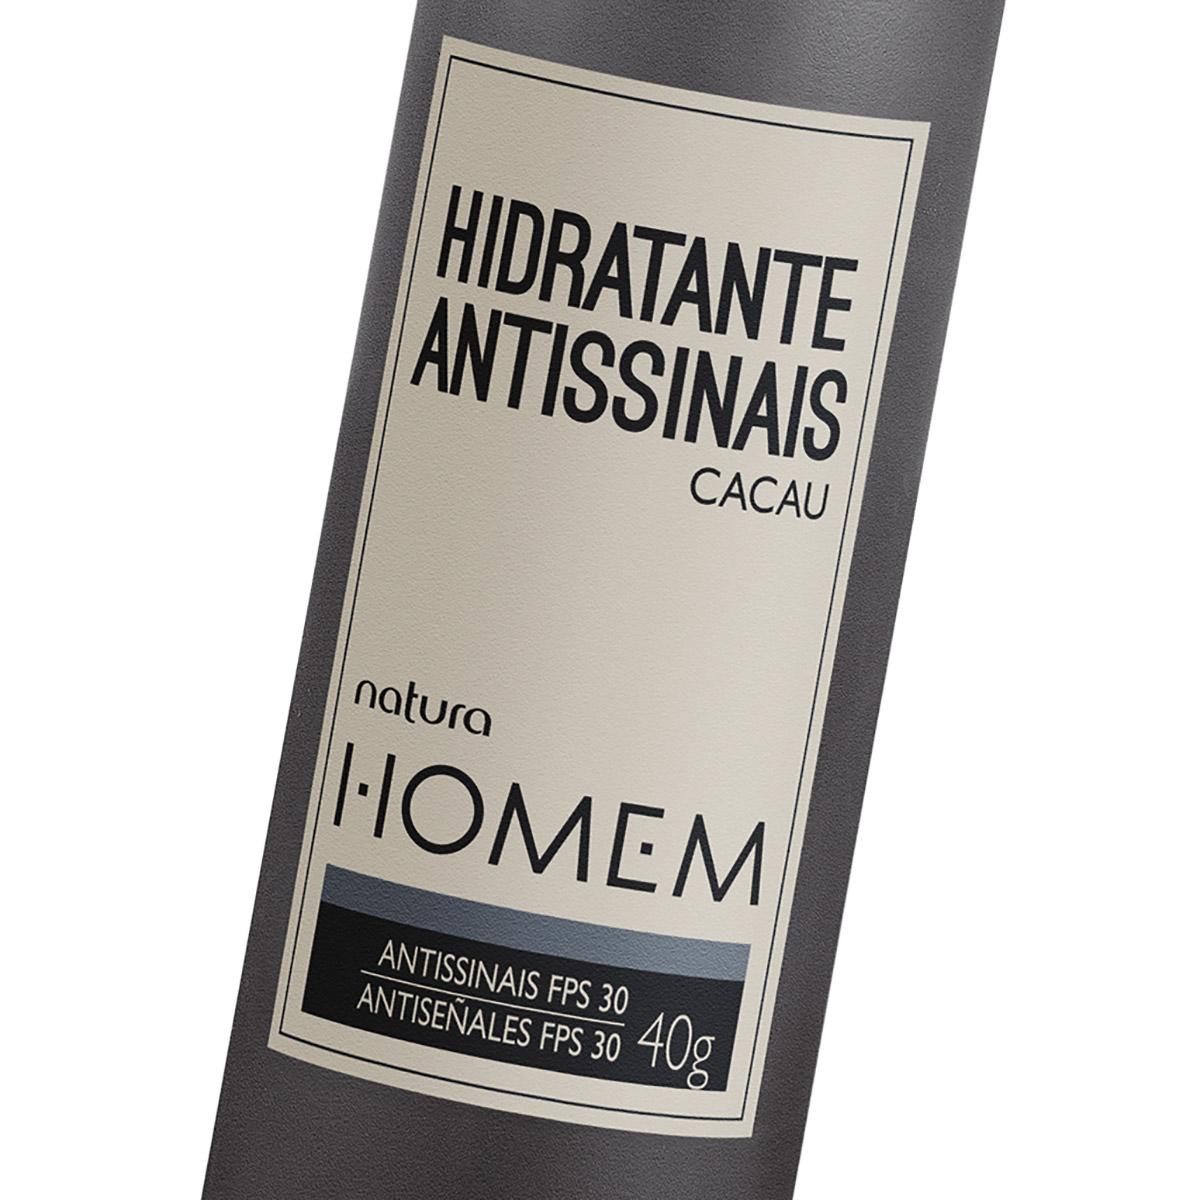 Hidratante Antissinais Natura Homem - 40g - 78933